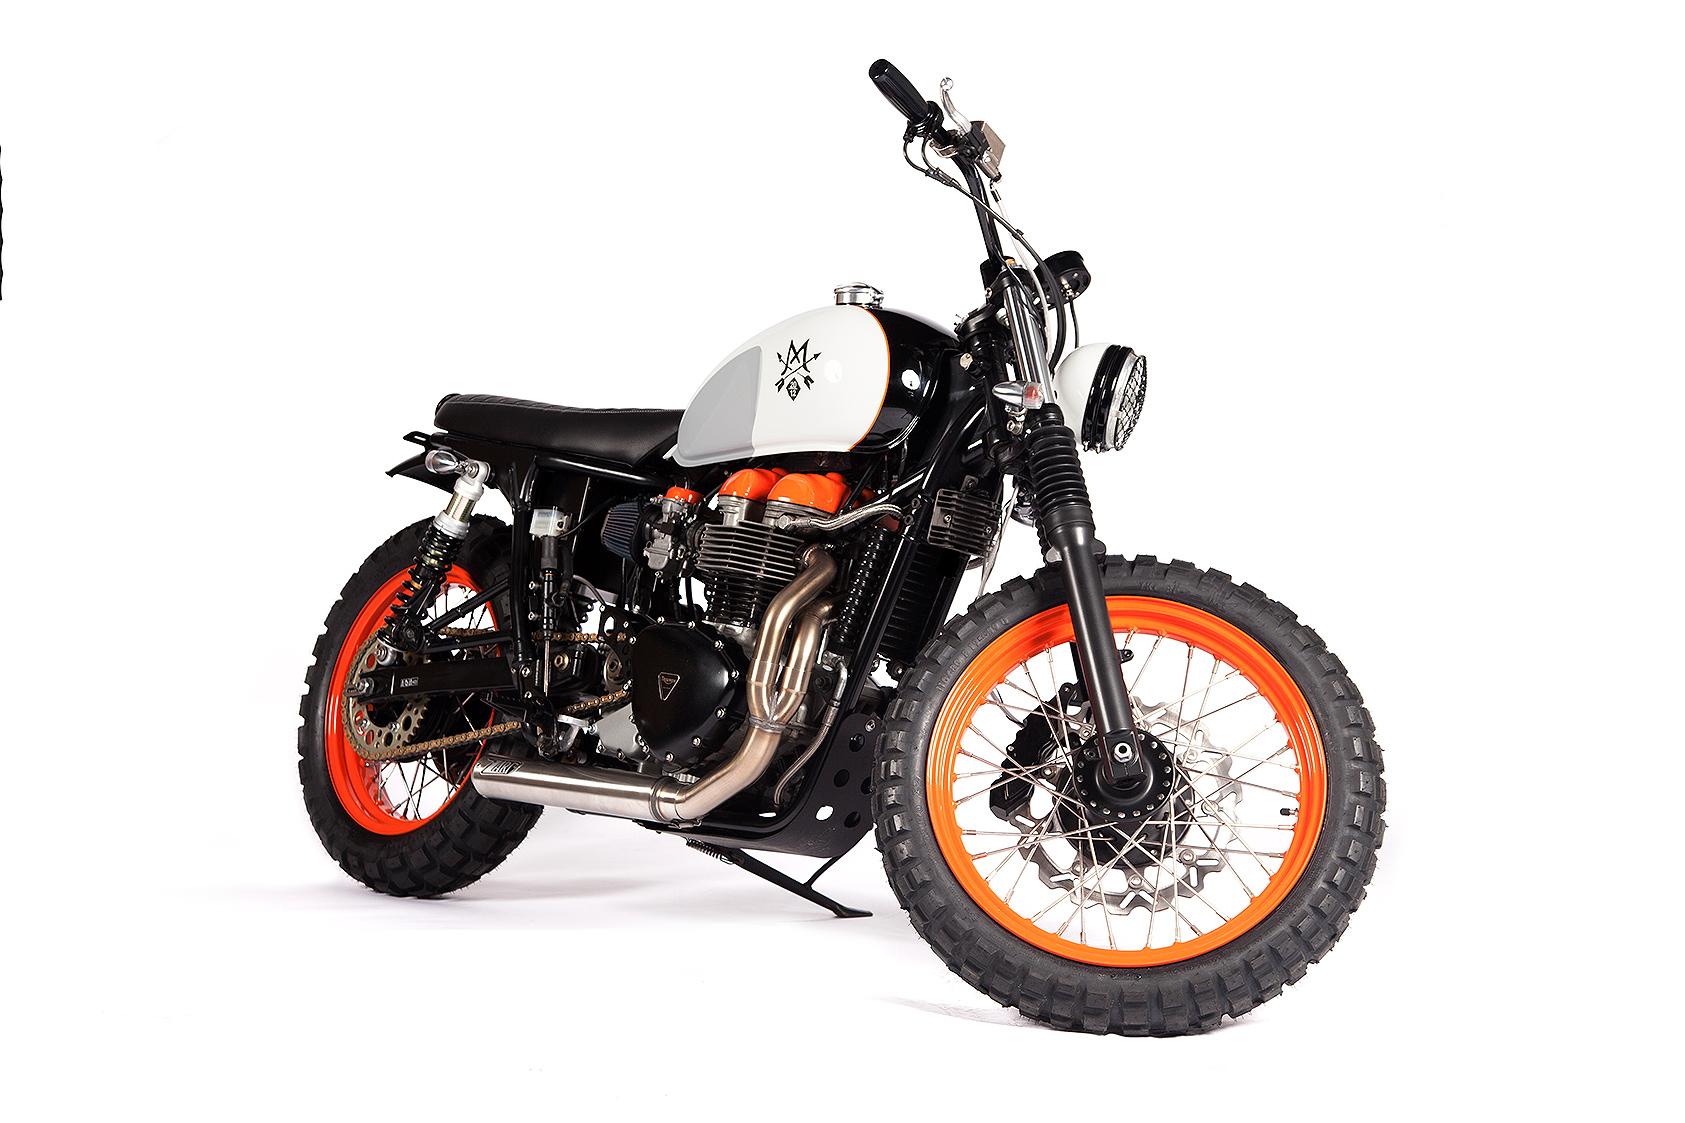 maria_motorcycles_triumph_bonneville_julijana_7560